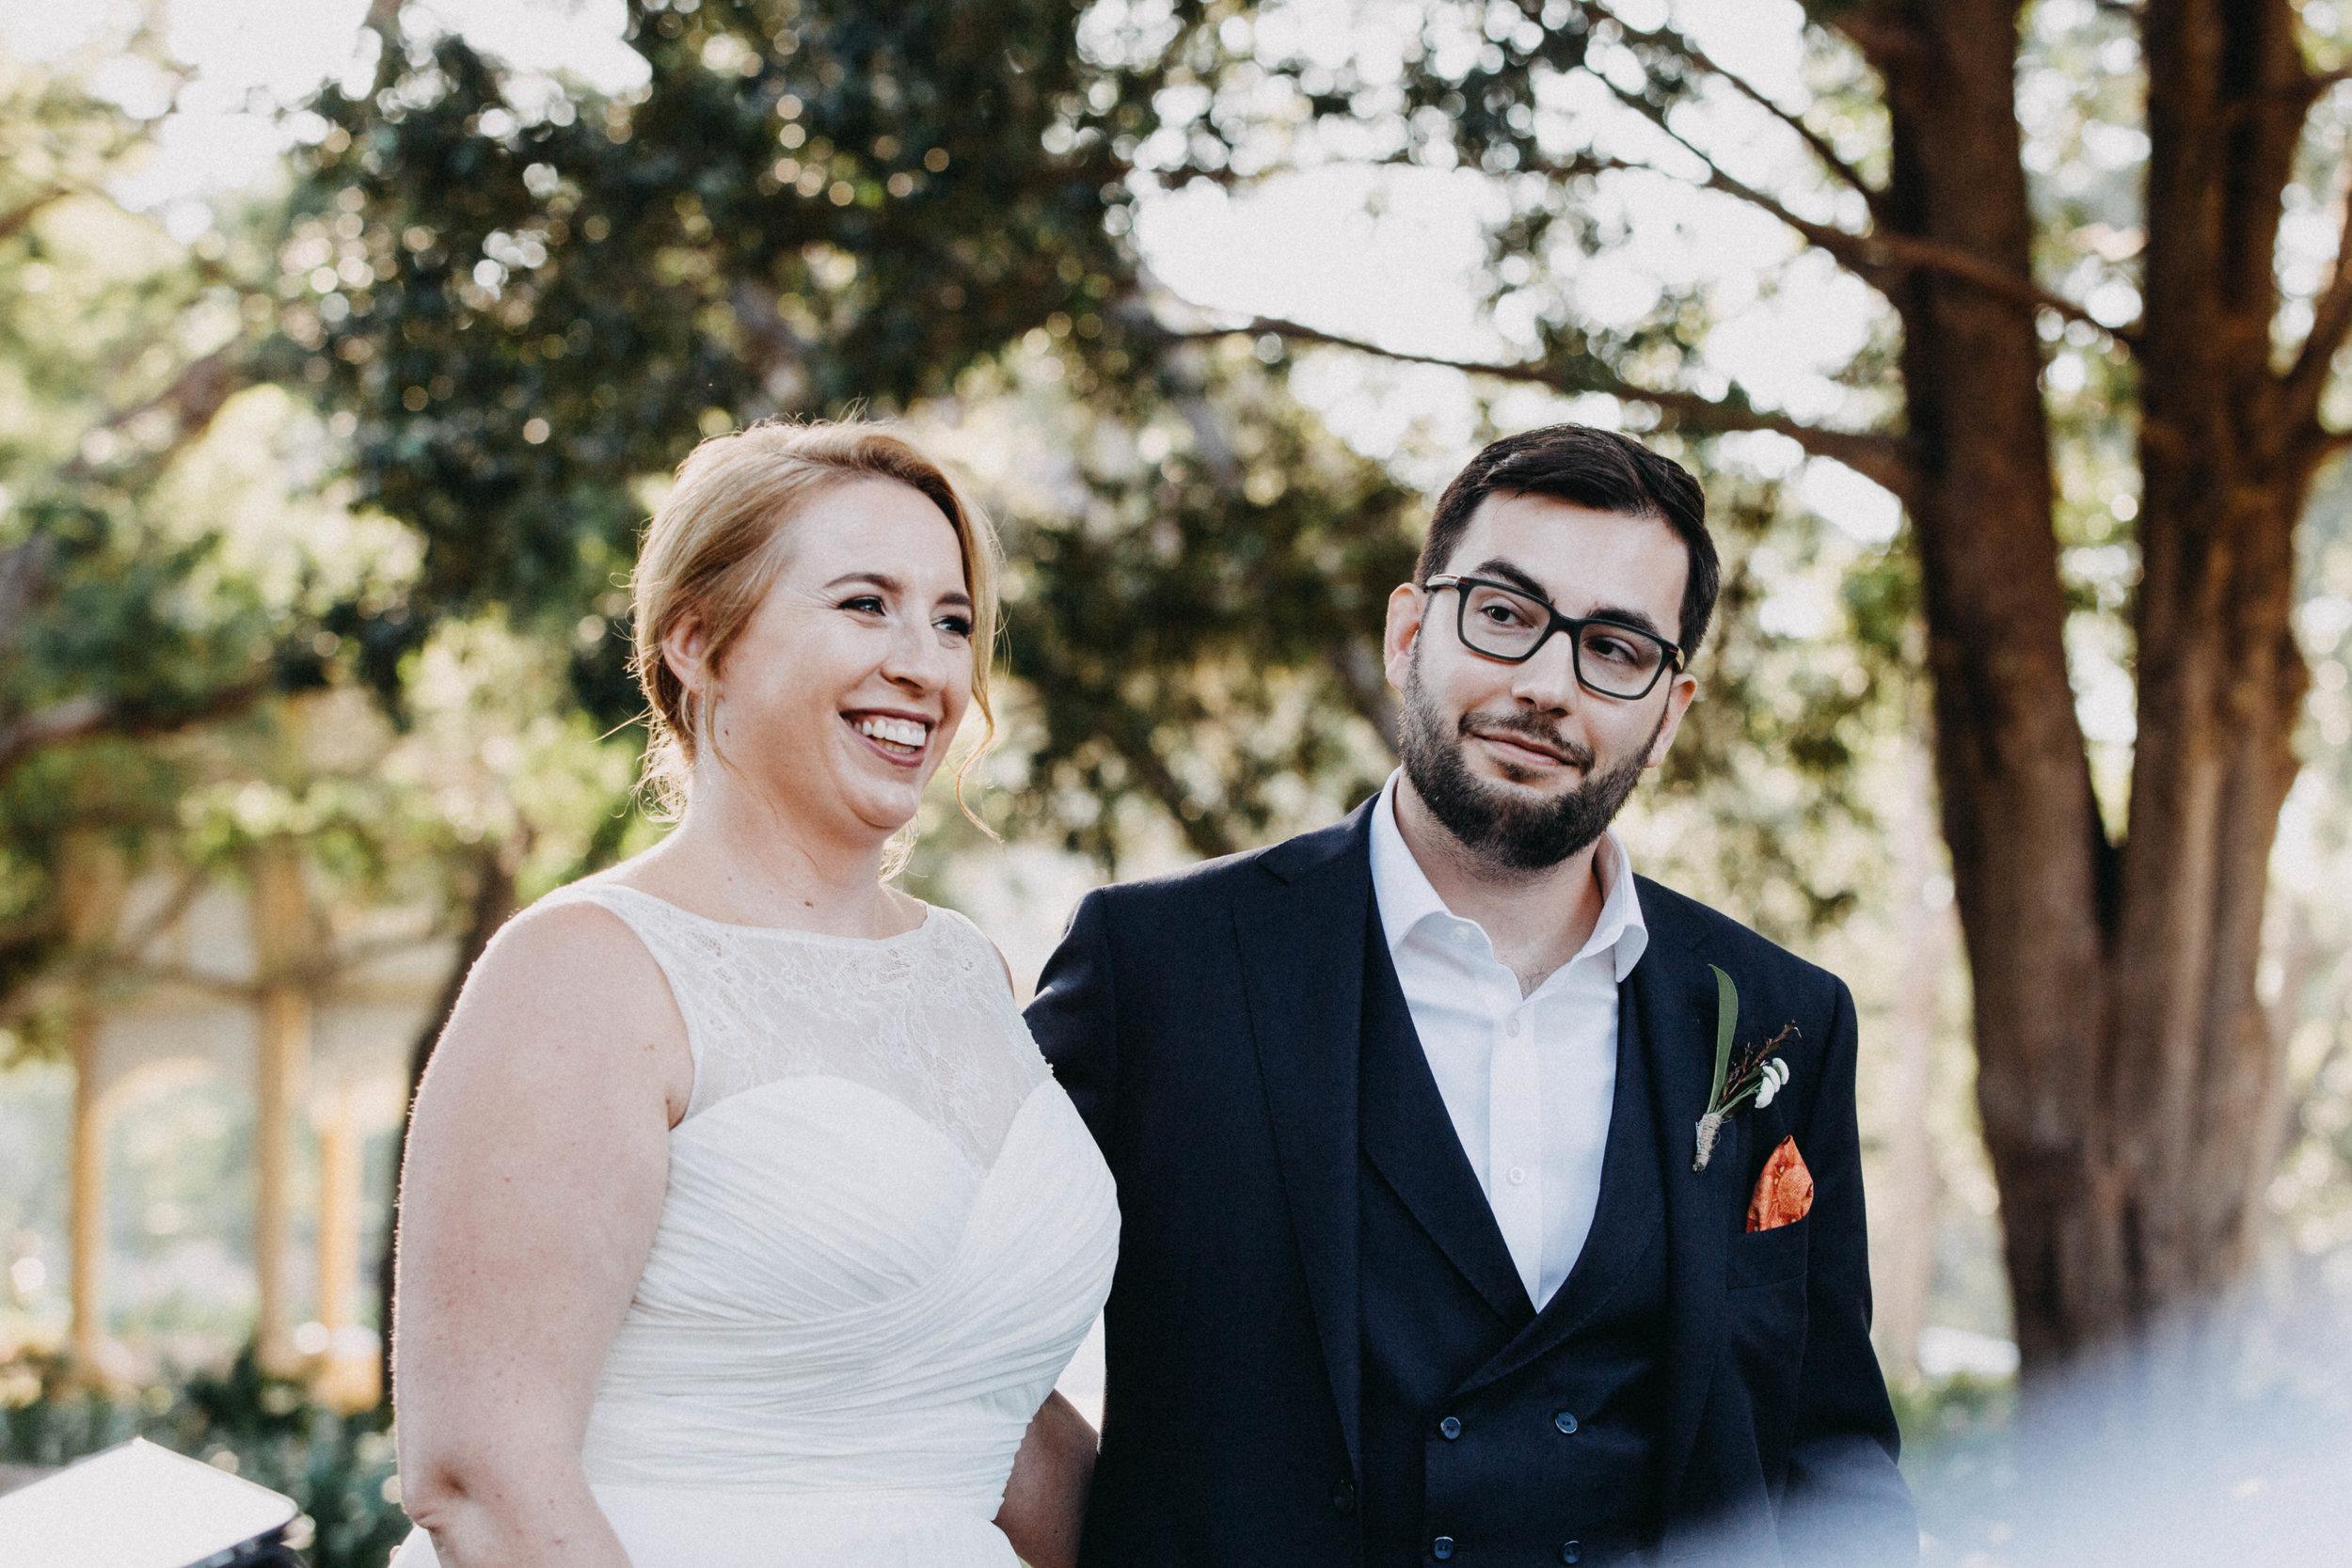 cabarita-park-sydney-wedding-emilyobrienphotography.net-18.jpg